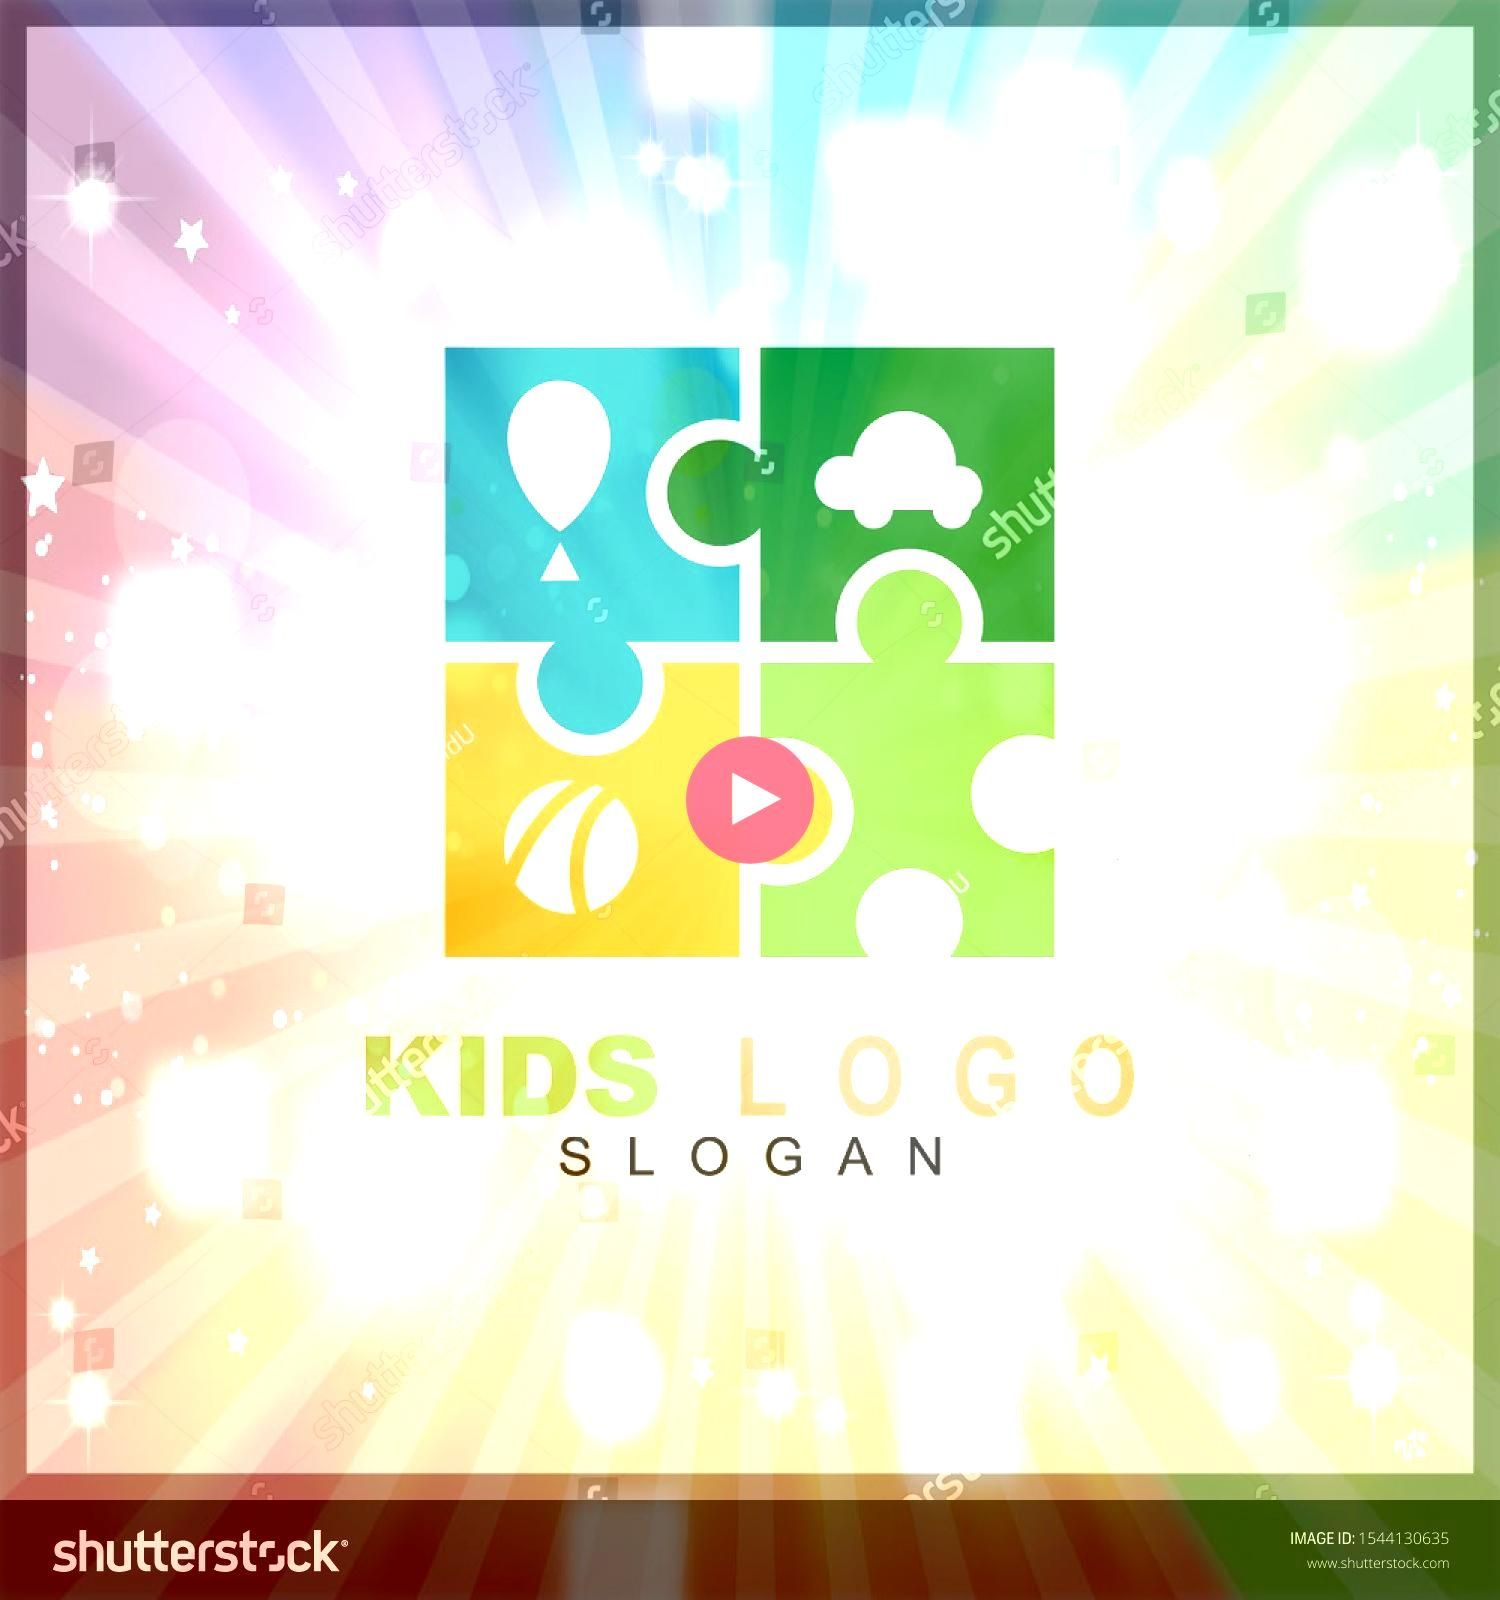 play colorful logo vector Children logo designs happy child design concept kid education logo logo element template Kids play colorful logo vector Children logo designs h...